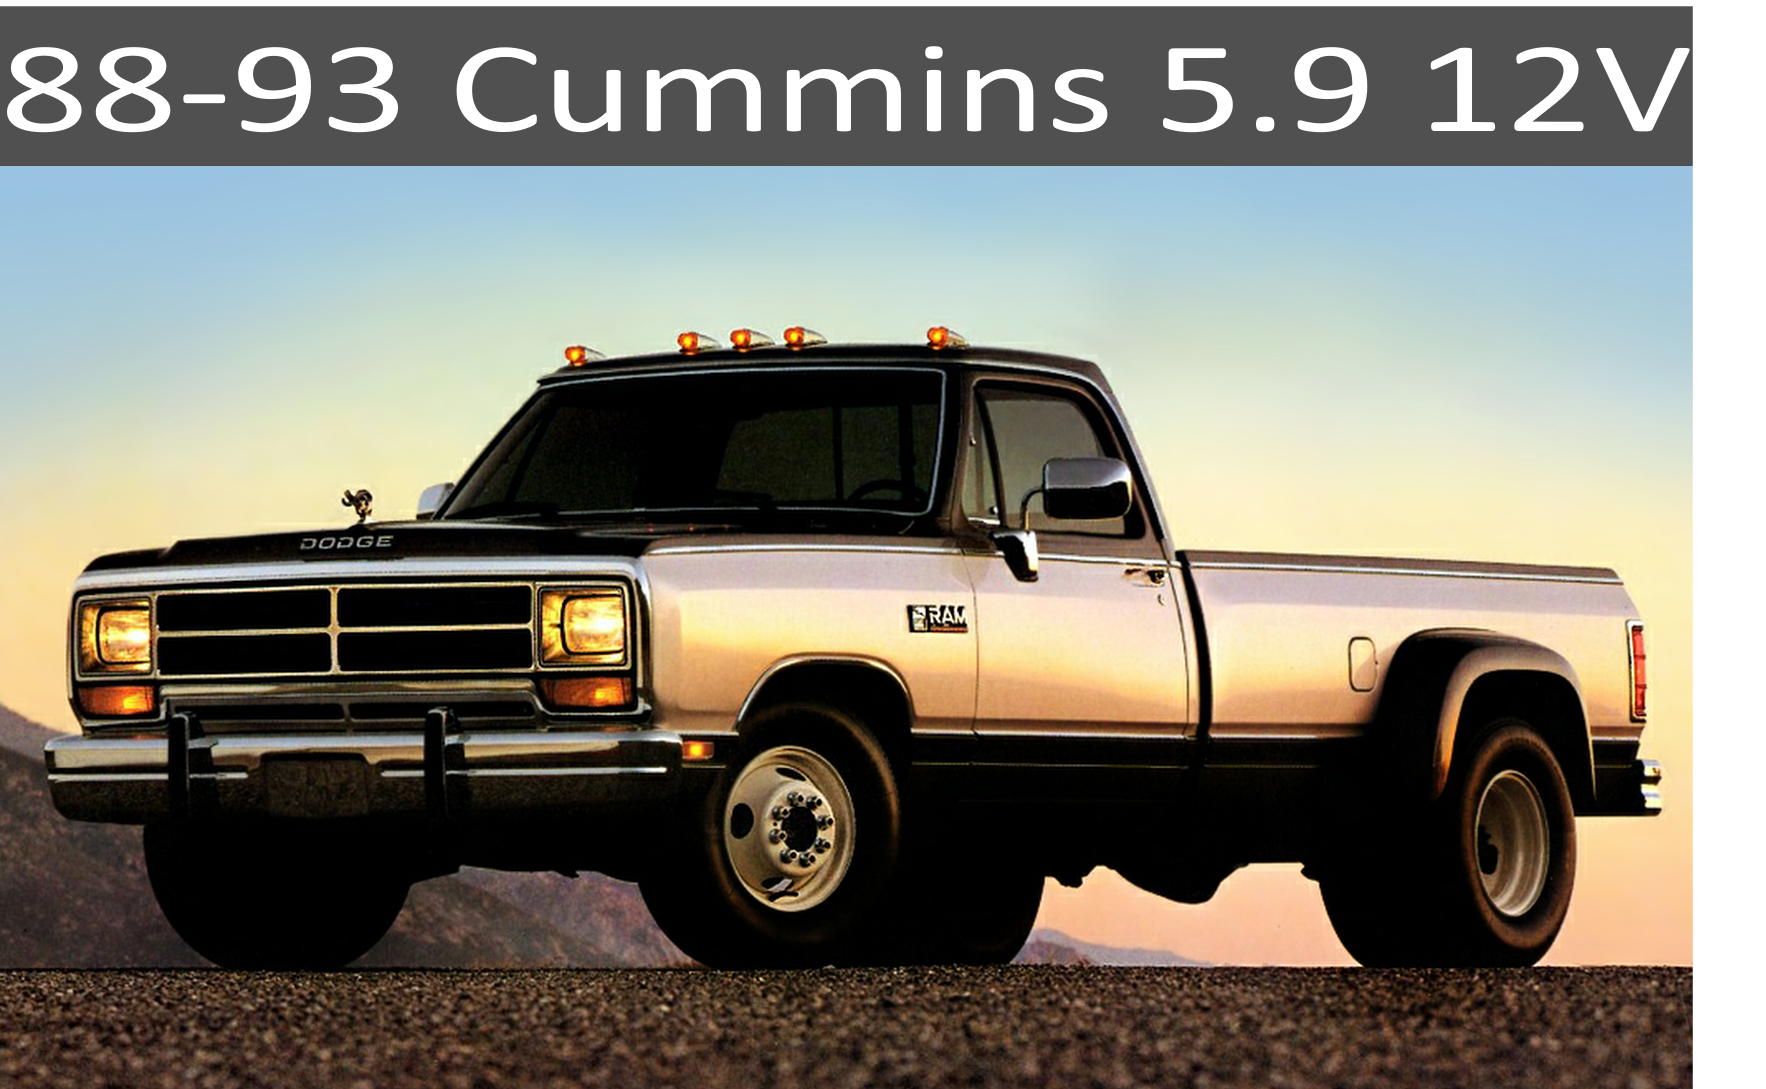 88-93 Dodge Cummins 5.9 Parts